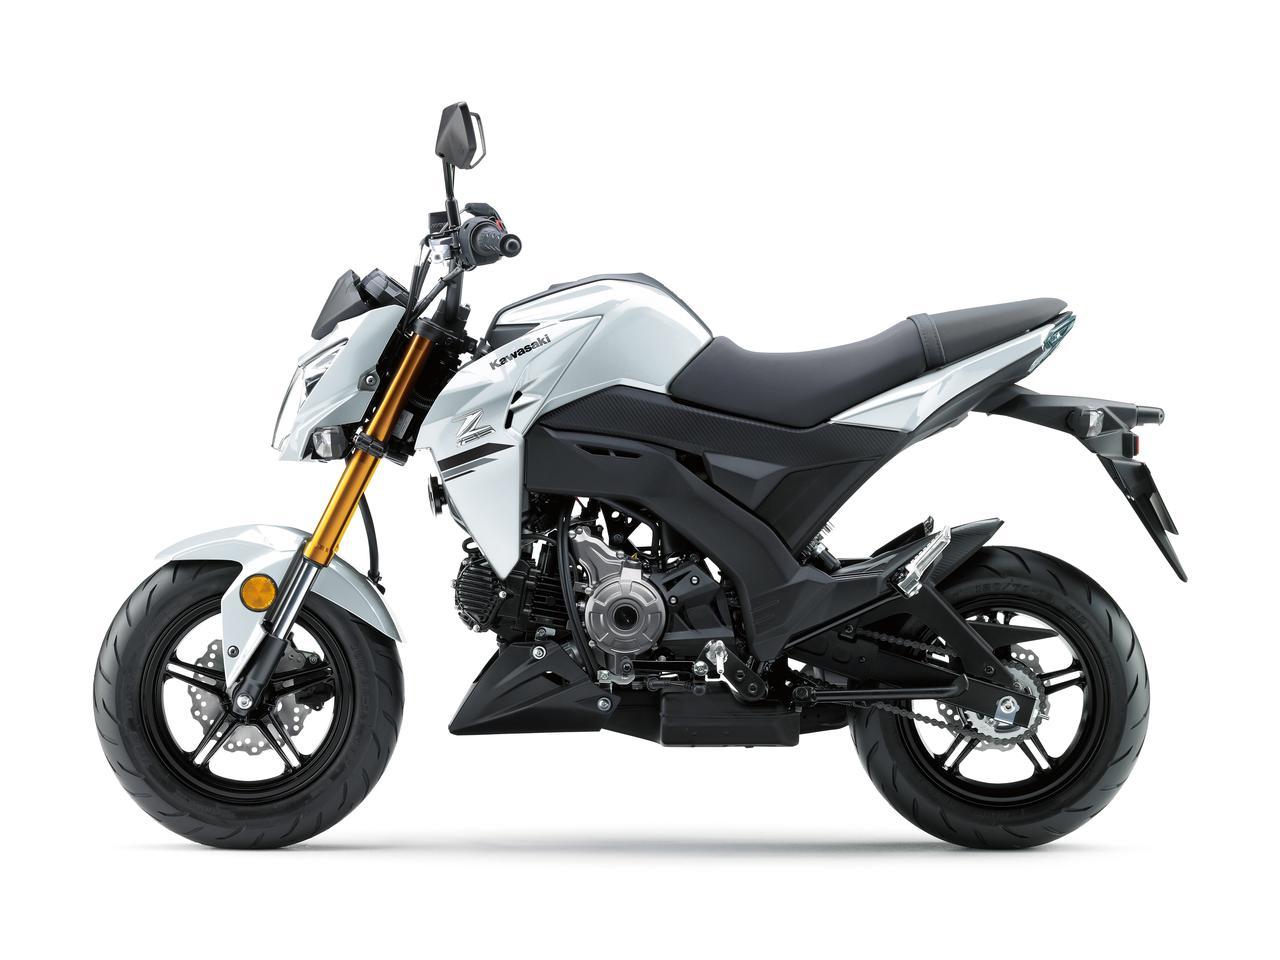 Images : 4番目の画像 - Z125 PROの写真を全て見る - LAWRENCE - Motorcycle x Cars + α = Your Life.